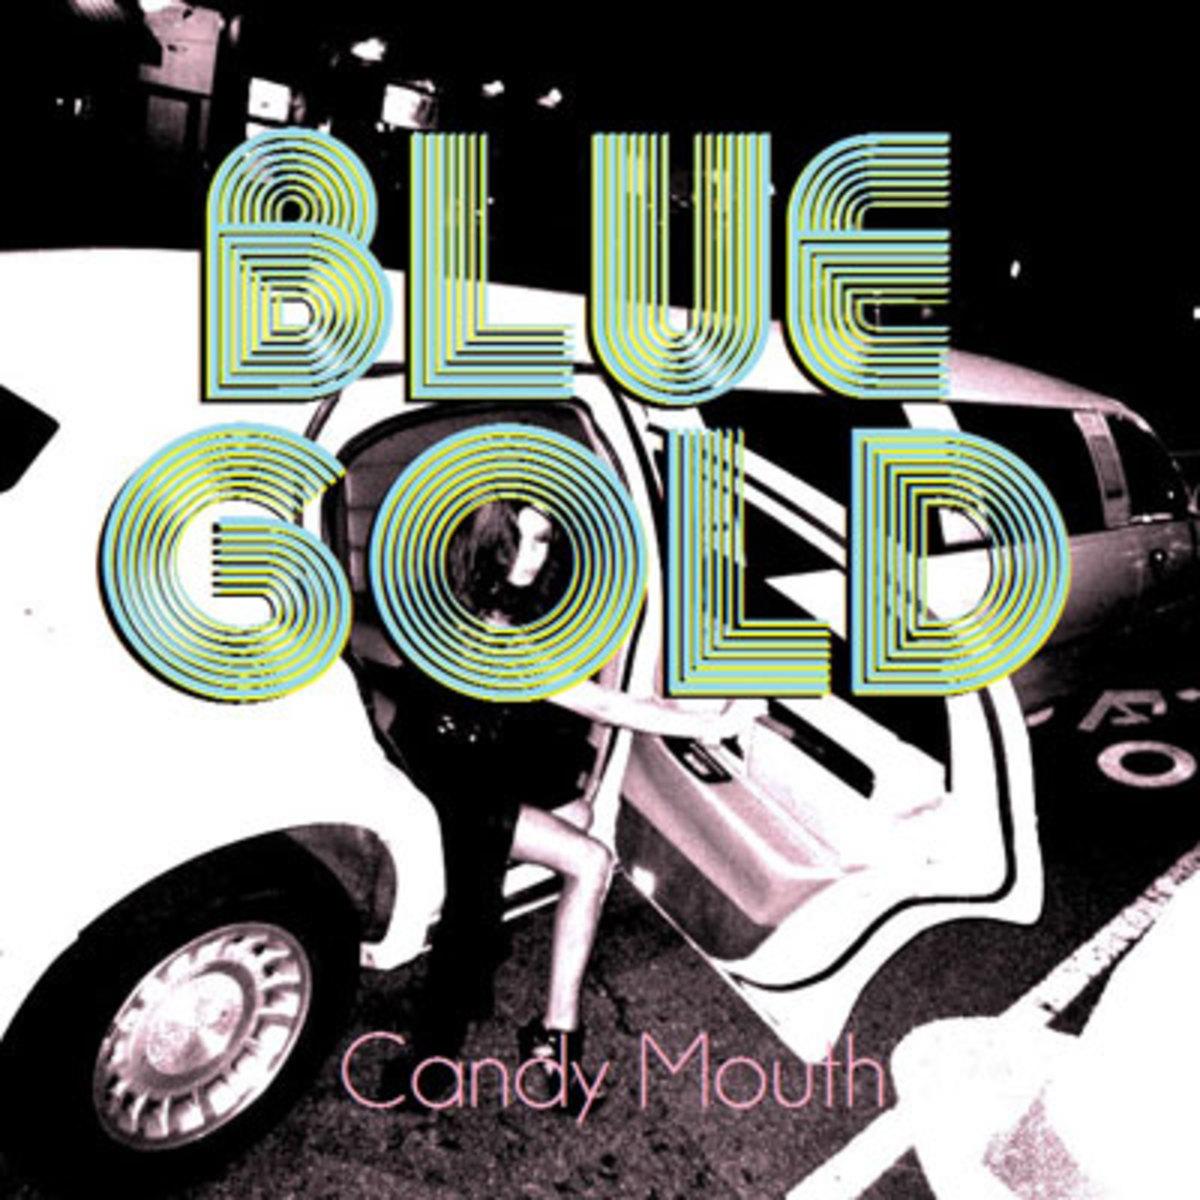 bluegold-candymouth.jpg